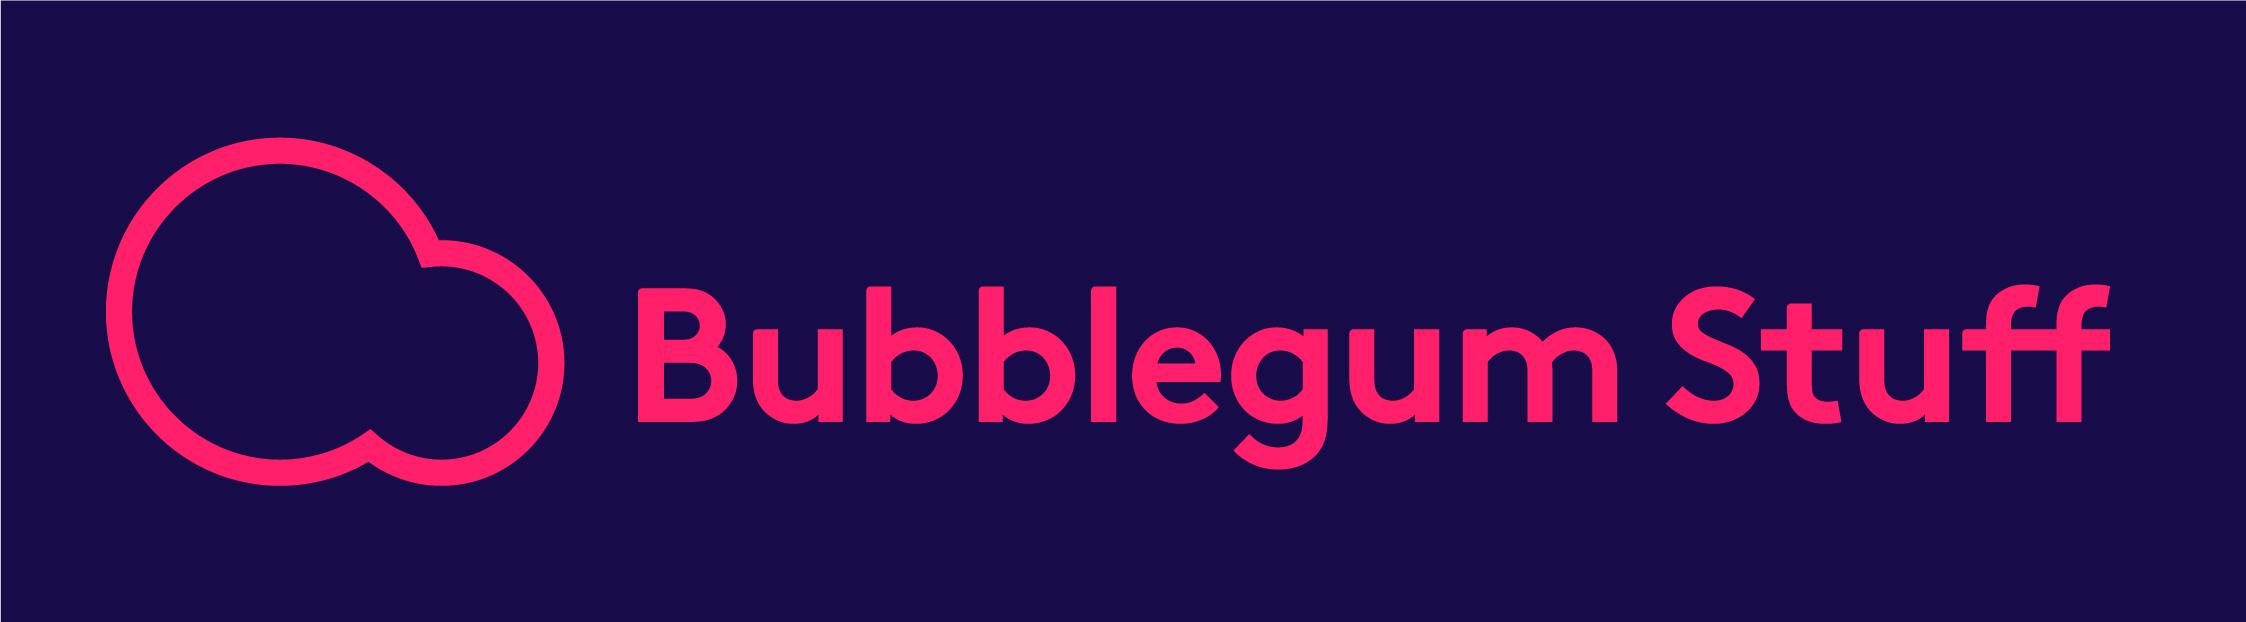 Bubblegum-Stuff-logo-BTHA